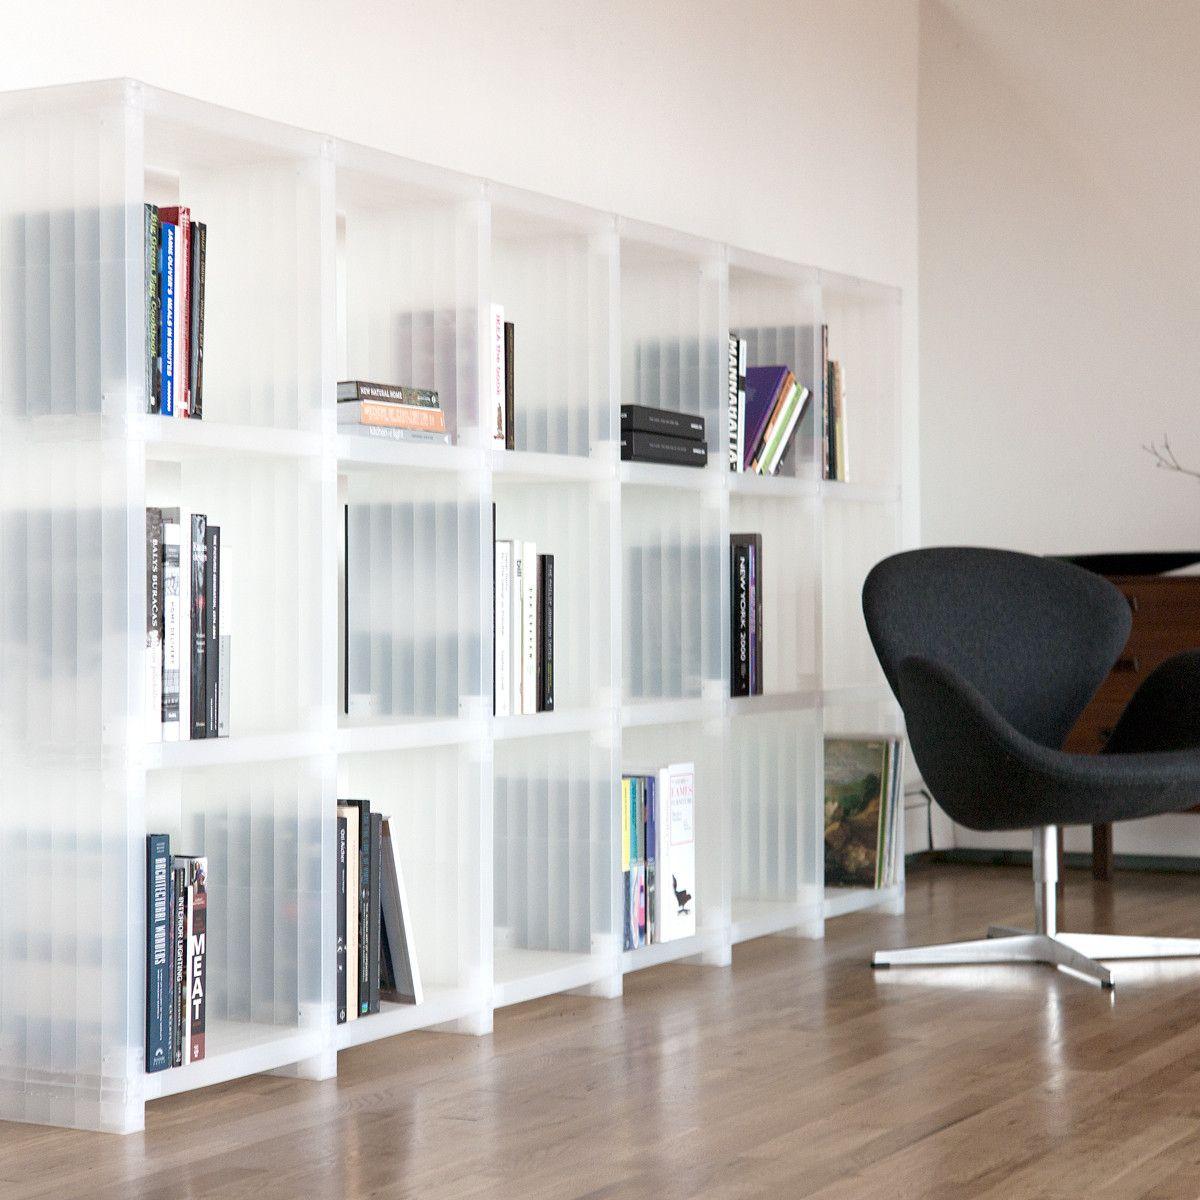 Cubitec Shelving System Clear By Cubitec Cubitec Shelving Shelving Modern Home Furniture